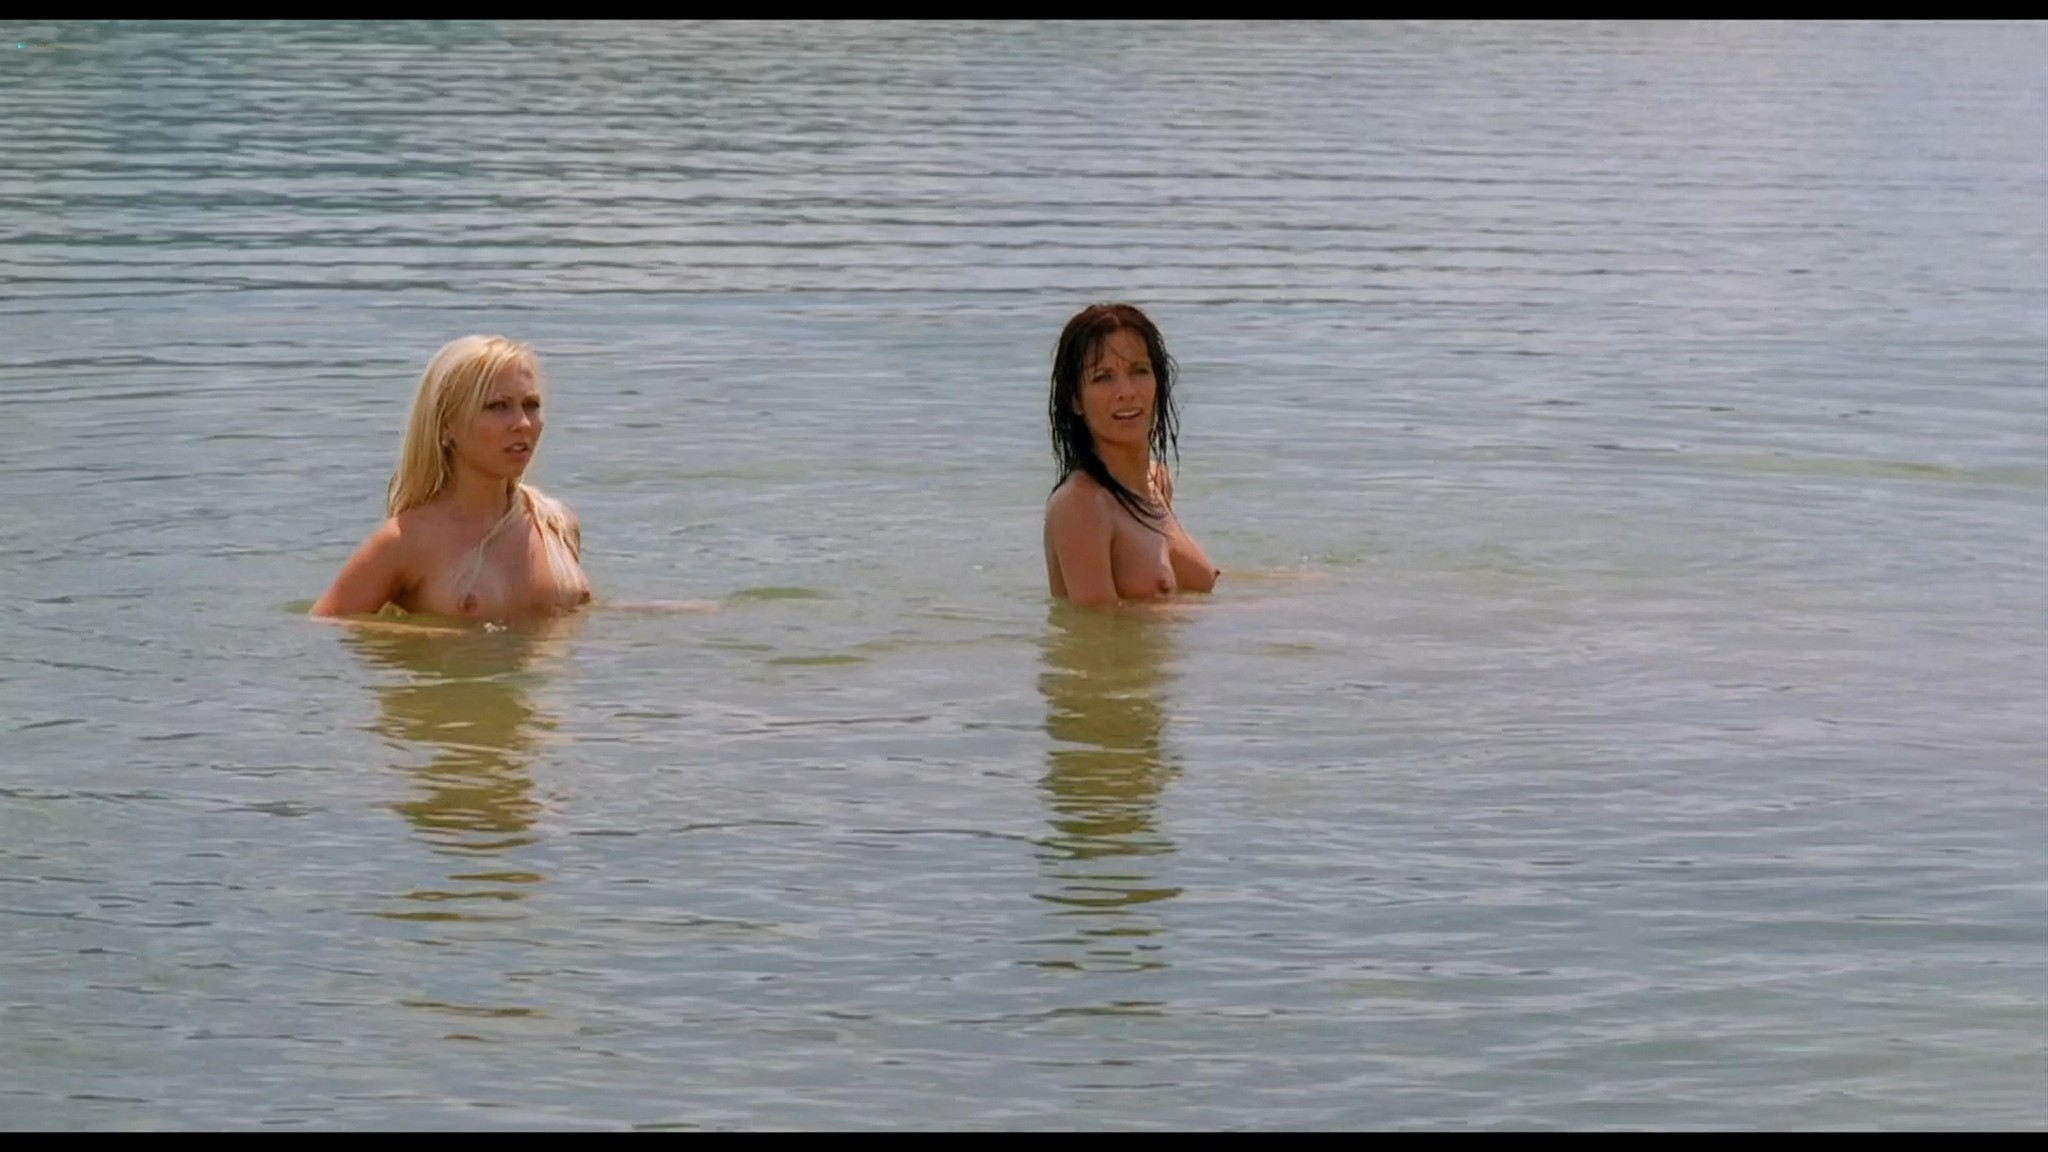 Zhasmina Toskova nude Yana Marinova nude topless Lake Placid 2 2007 HD 1080p BluRay 011